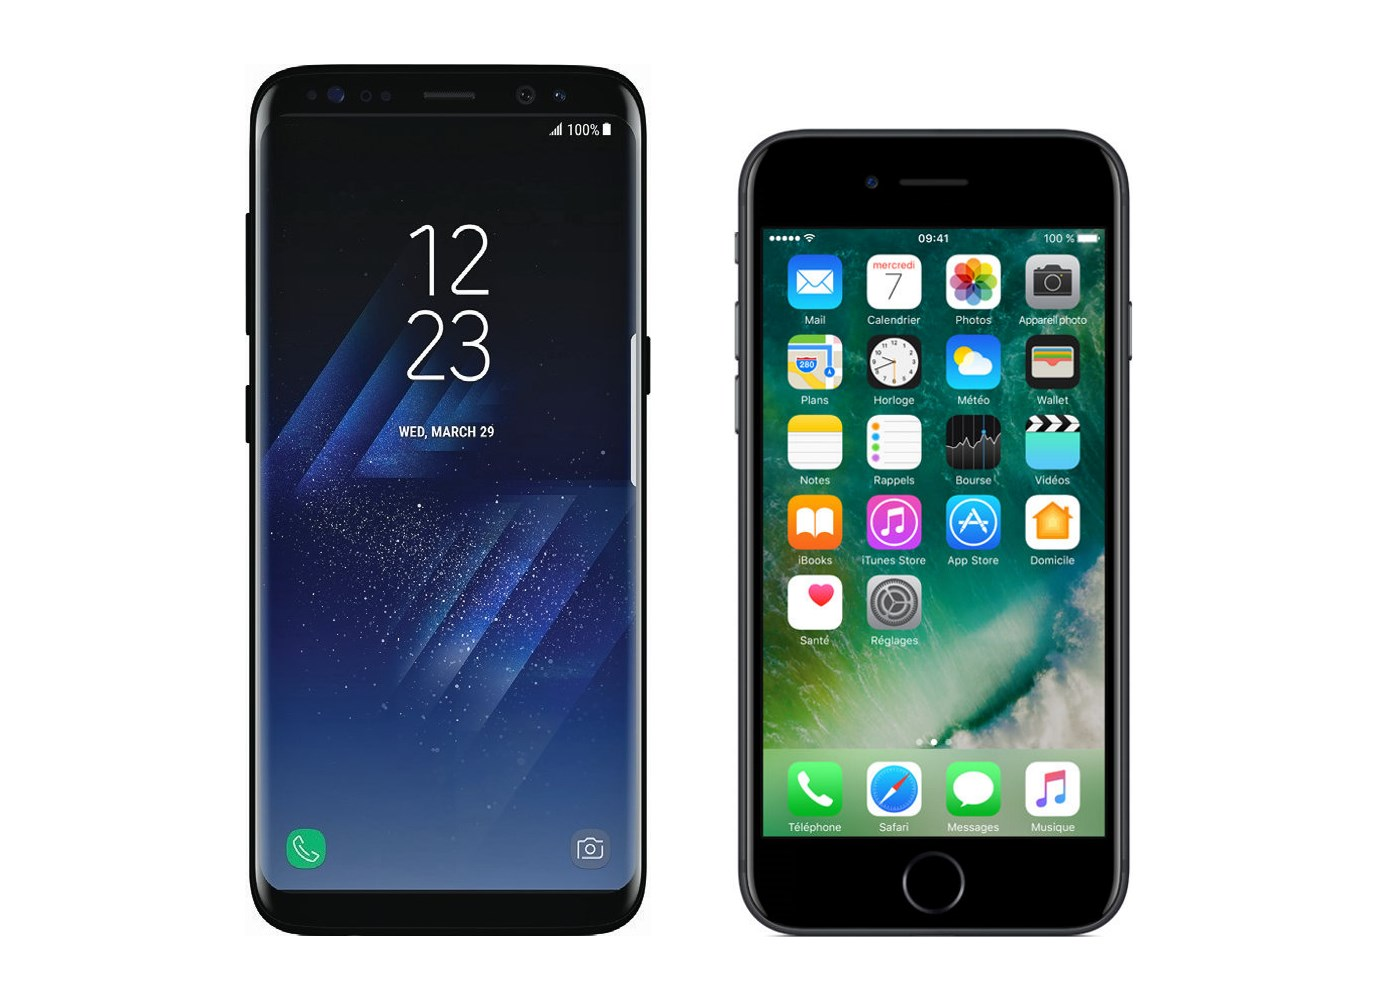 samsung galaxy s8 vs apple iphone 7 le cor en ringardise. Black Bedroom Furniture Sets. Home Design Ideas